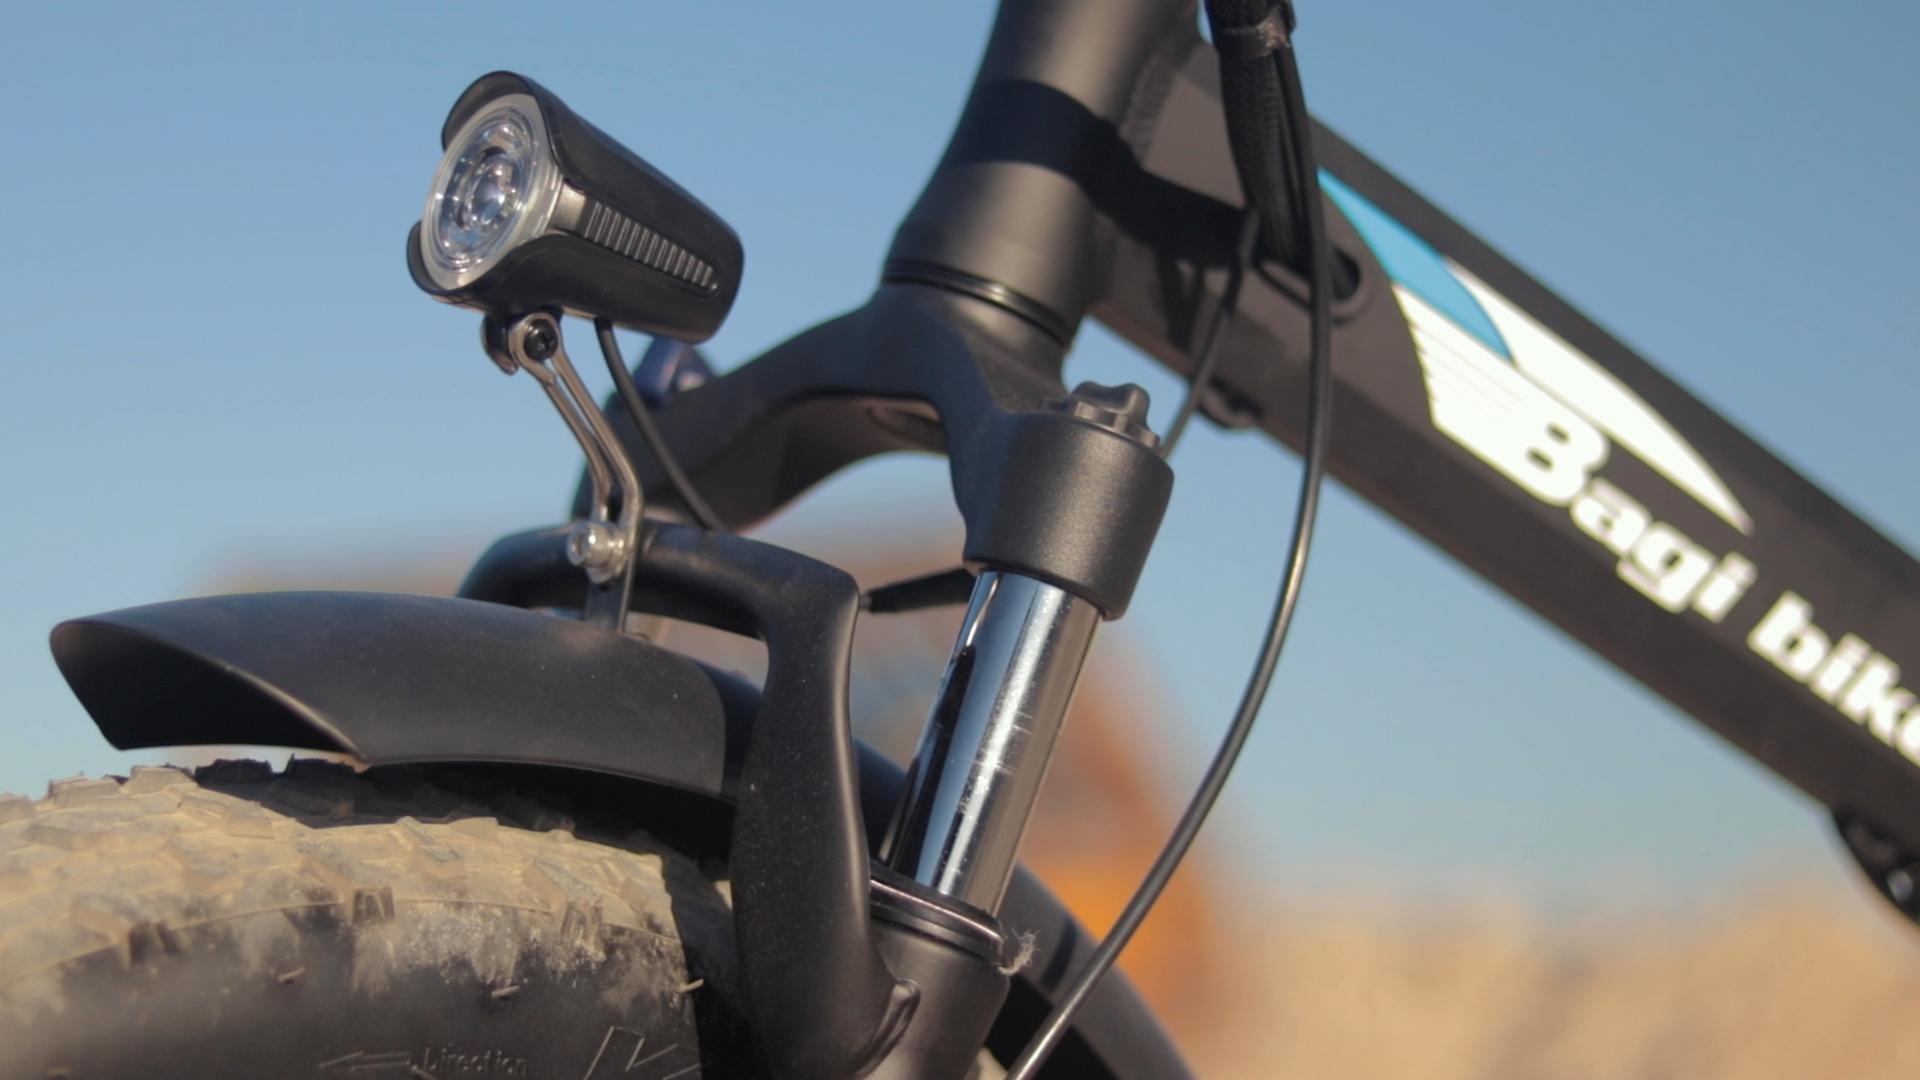 electrified-reviews-bagibike-b20-premium-electric-bike-review-mozo-suspension.jpg